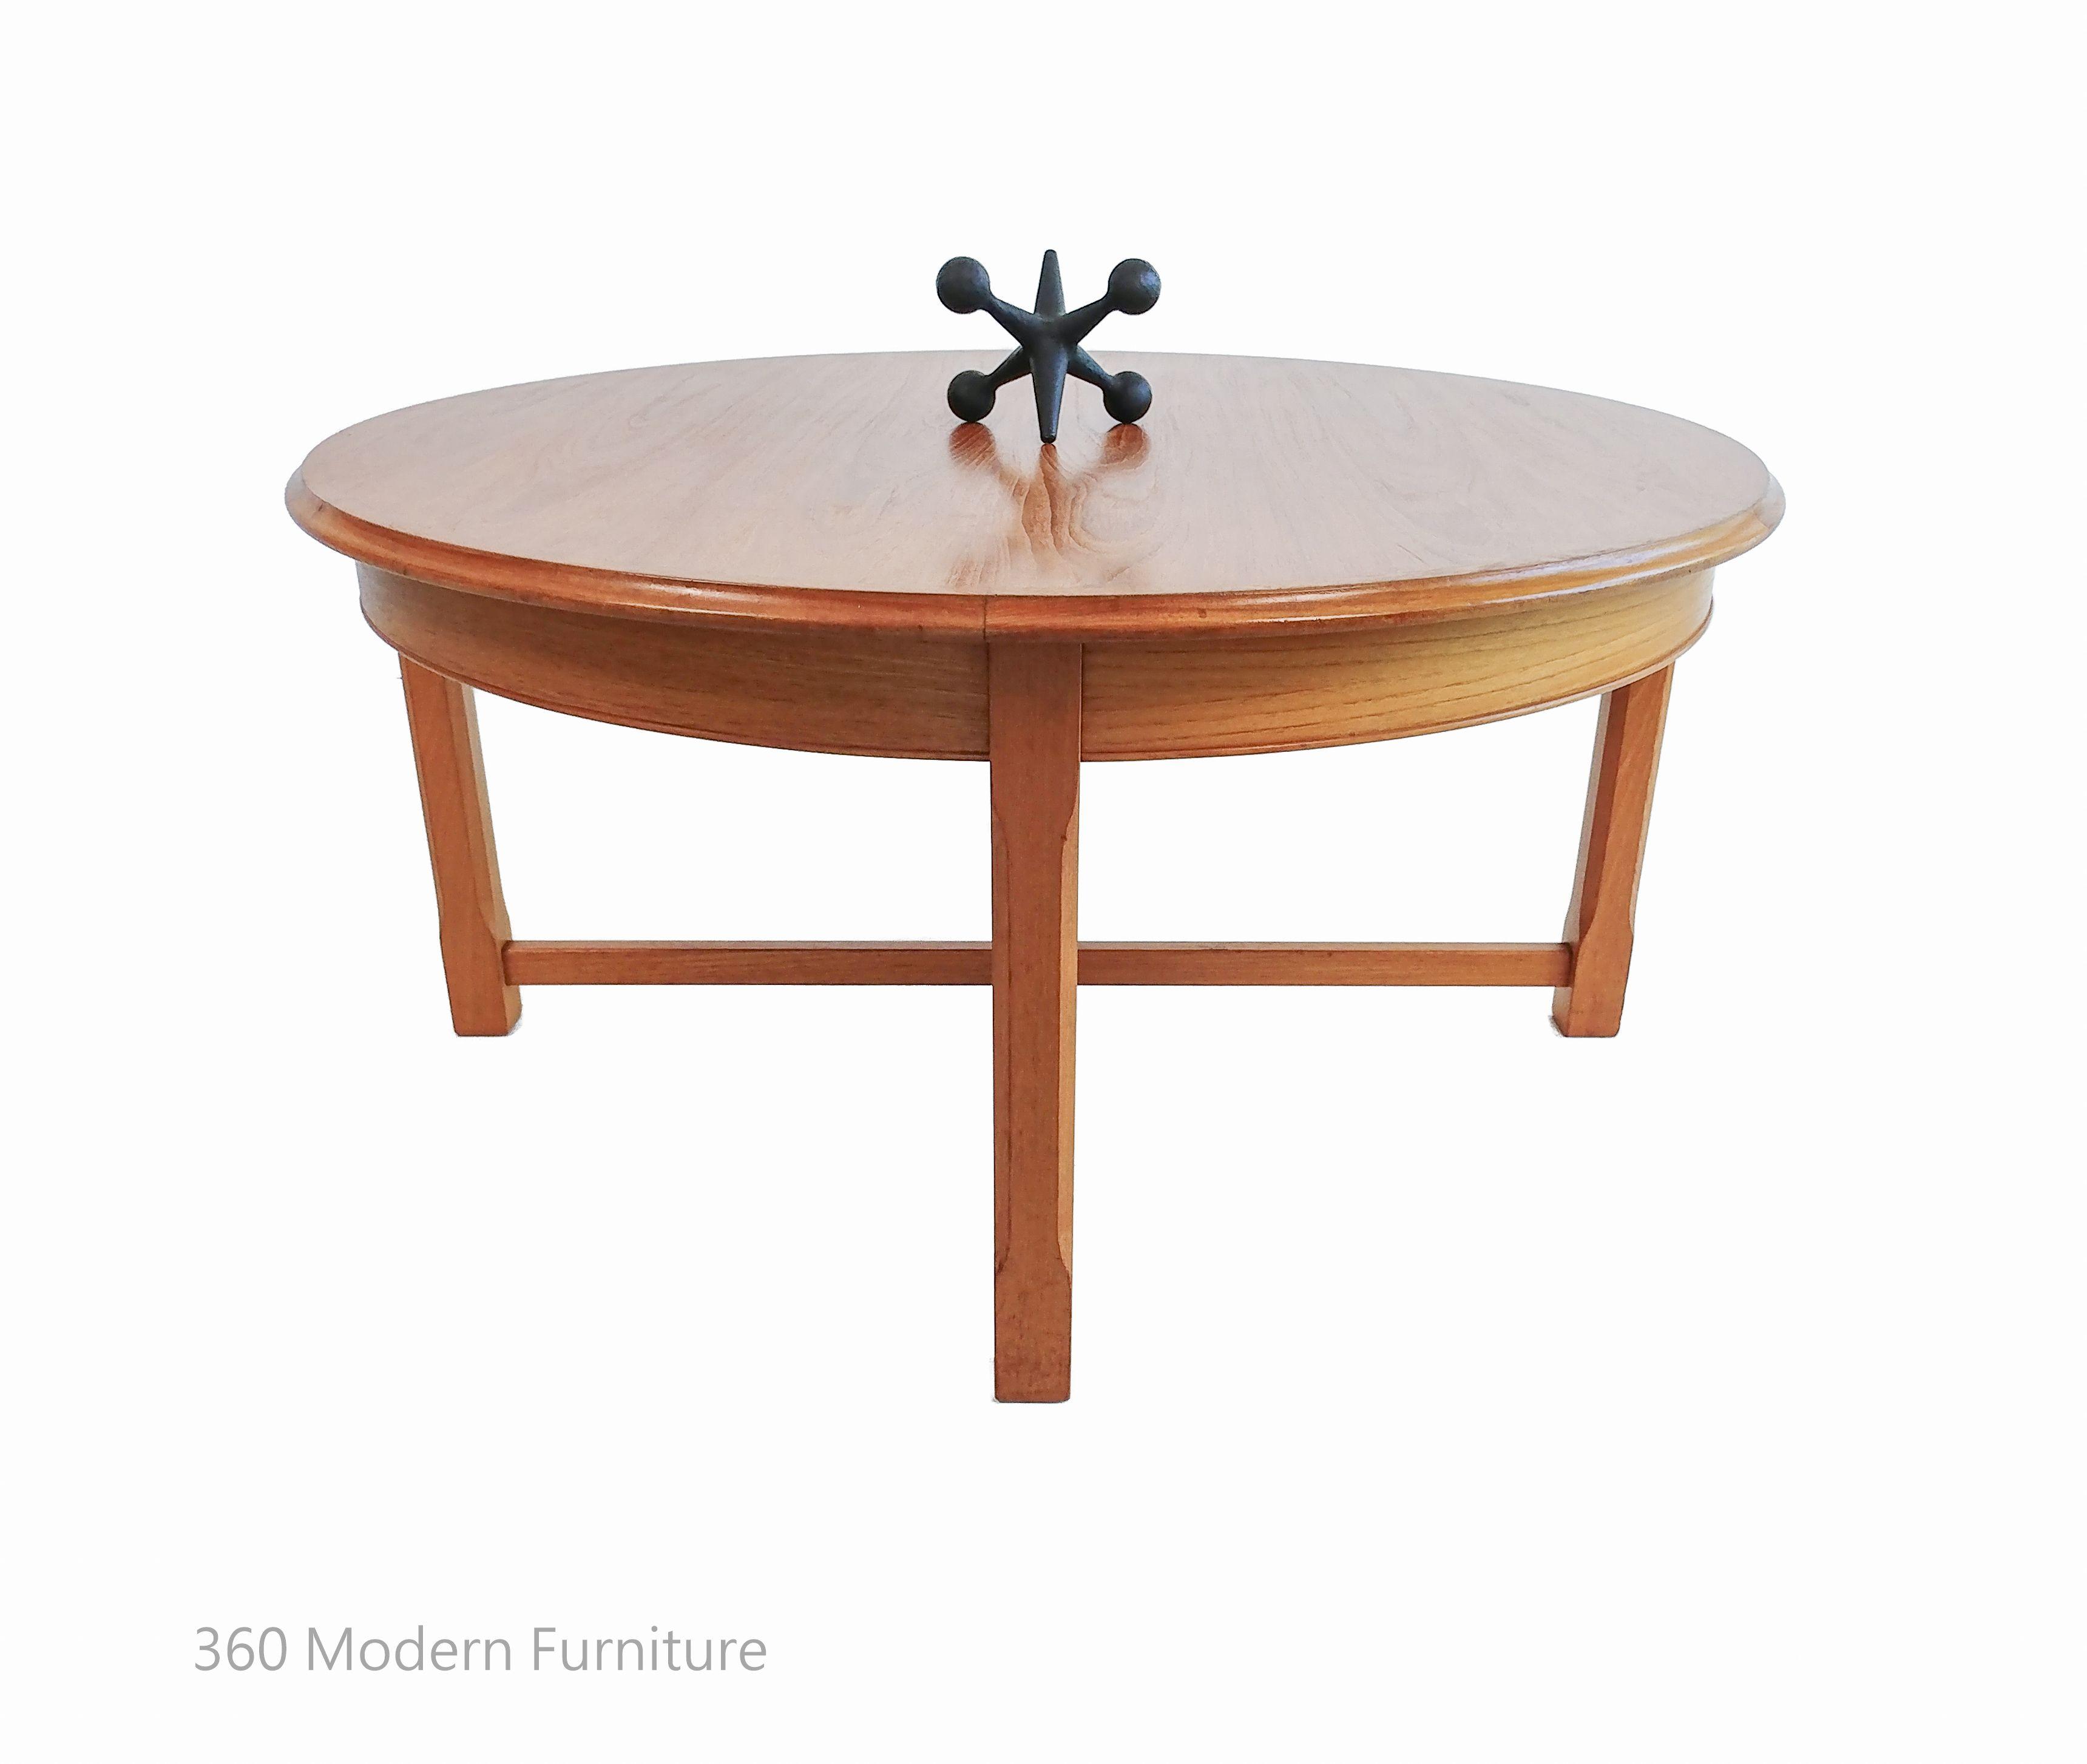 Parker Mid Century Modern Coffee Table Teak Round Retro Vintage 360 Modern Furniture Mid Century Modern Coffee Table Mid Century Coffee Table Coffee Table